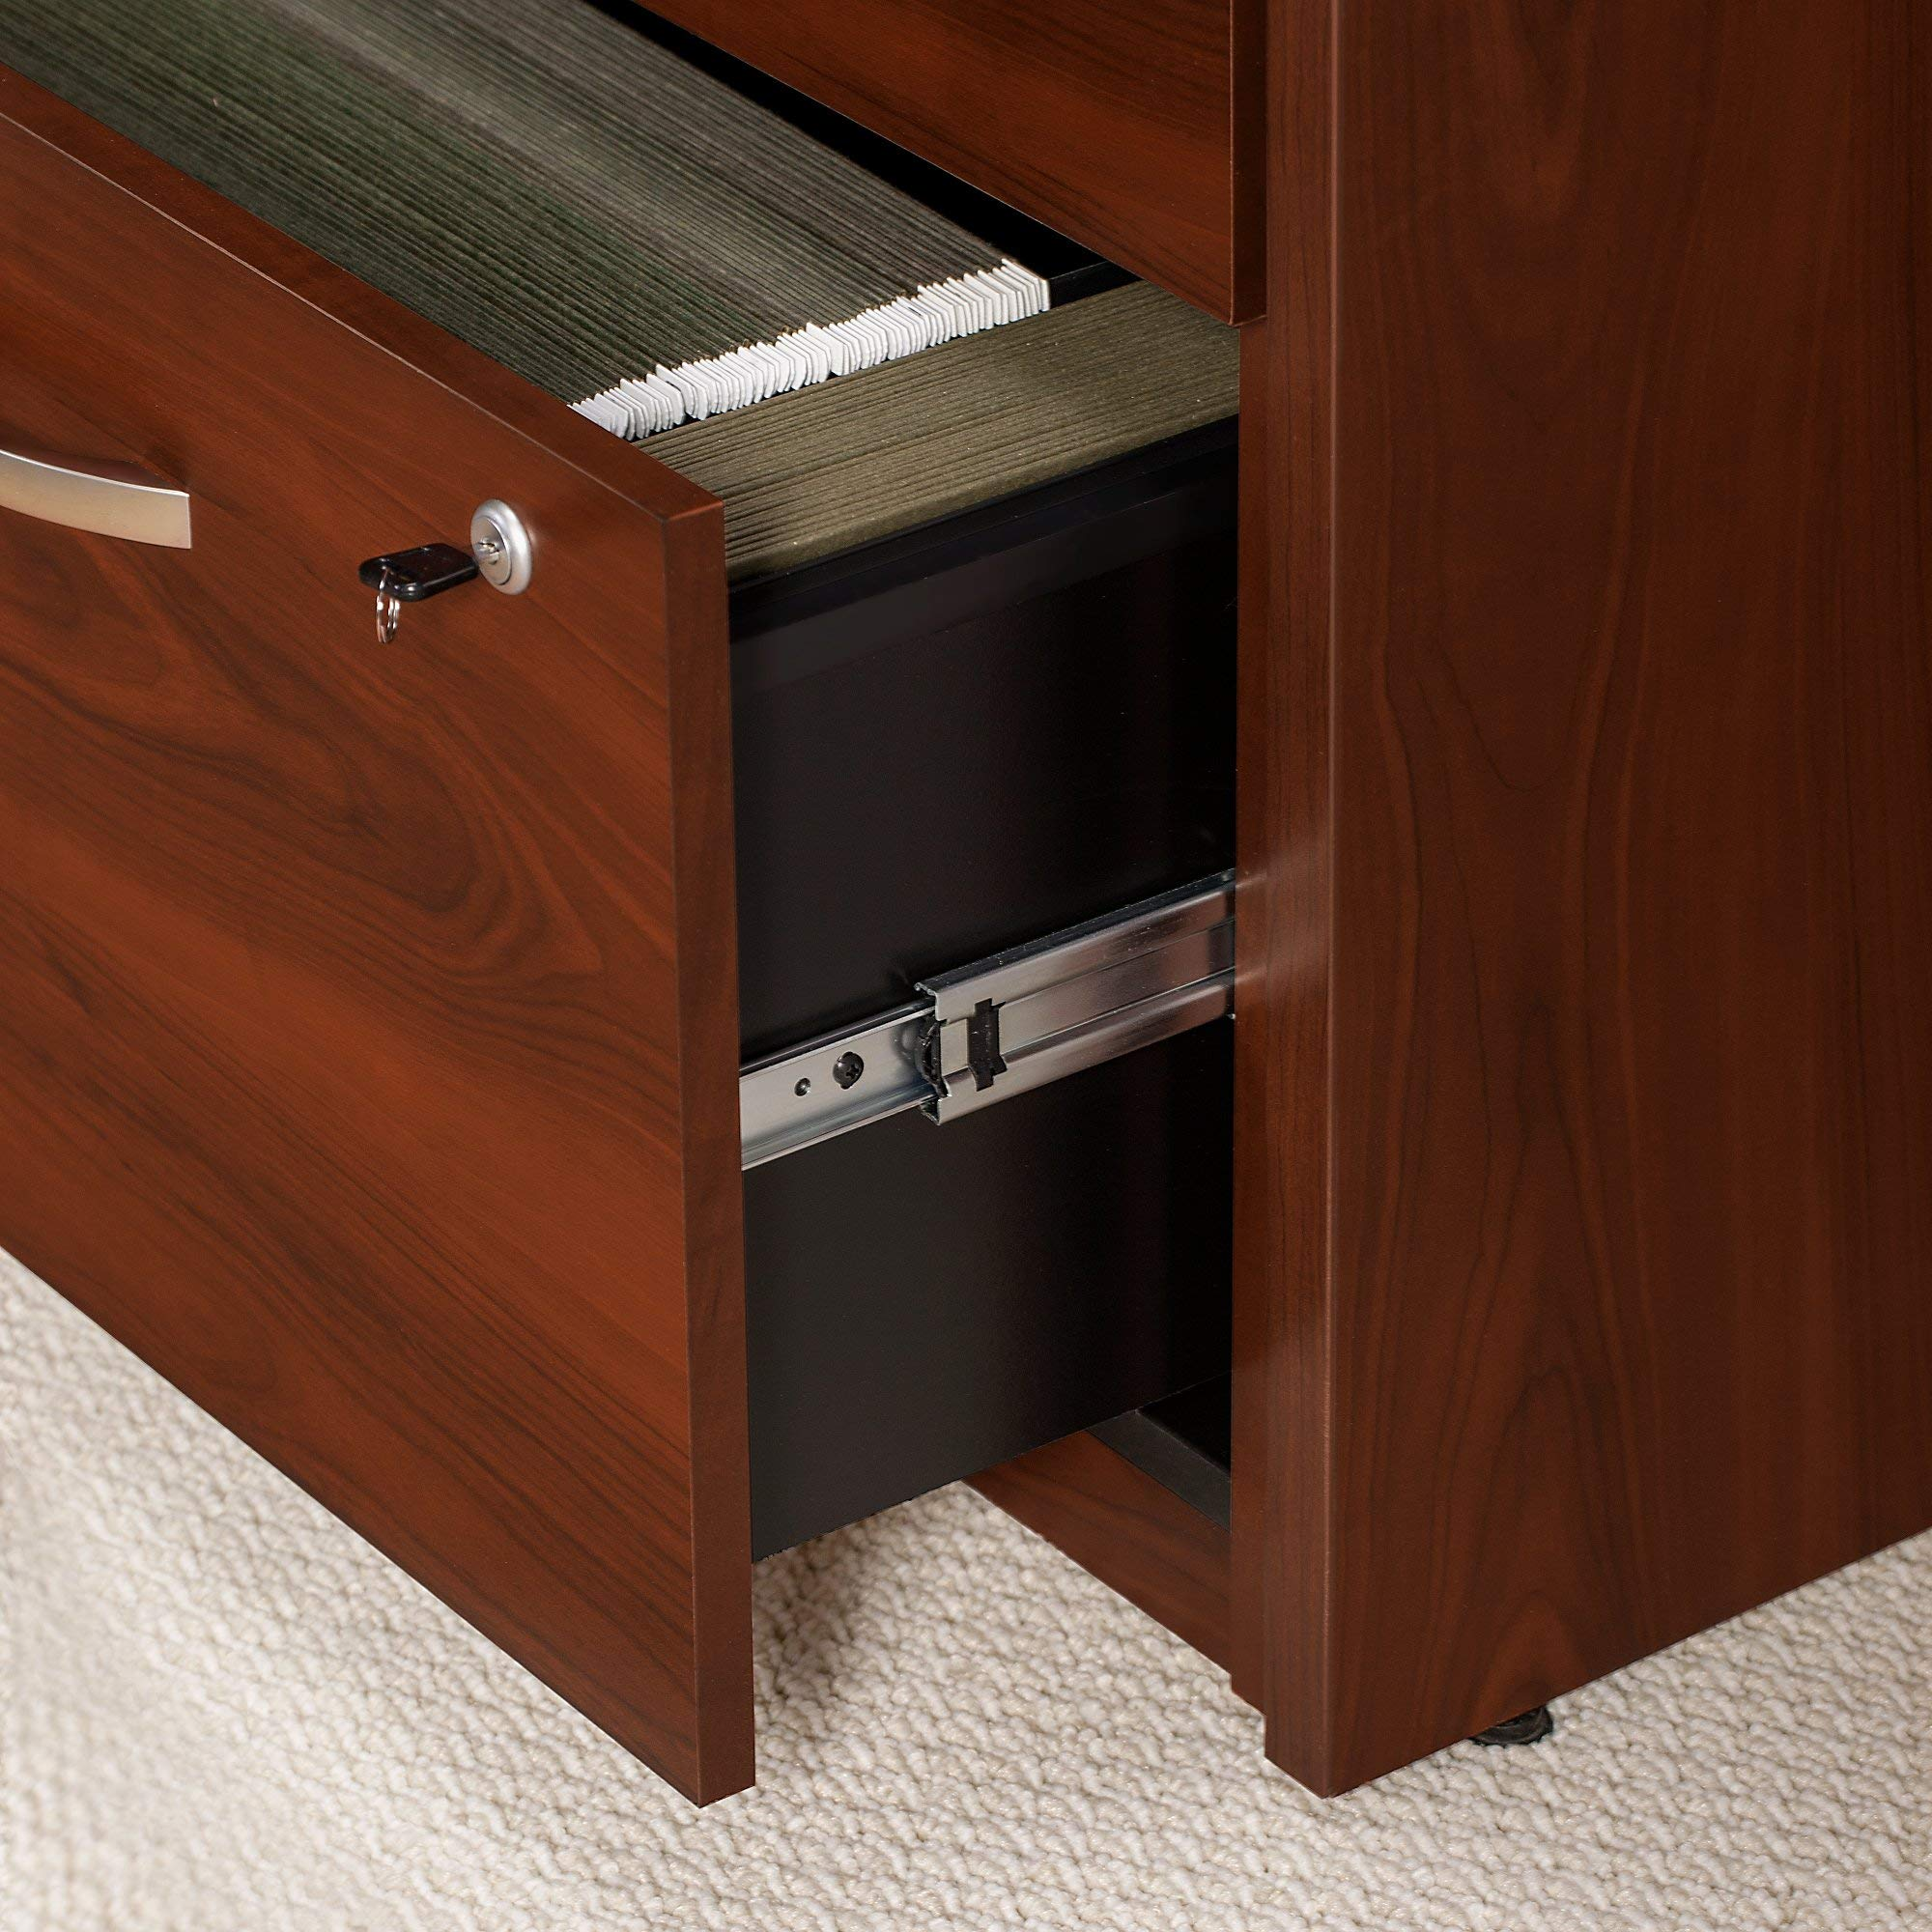 Bush Business Furniture Series C Elite Storage Credenza, Hansen Cherry by Bush Business Furniture (Image #5)